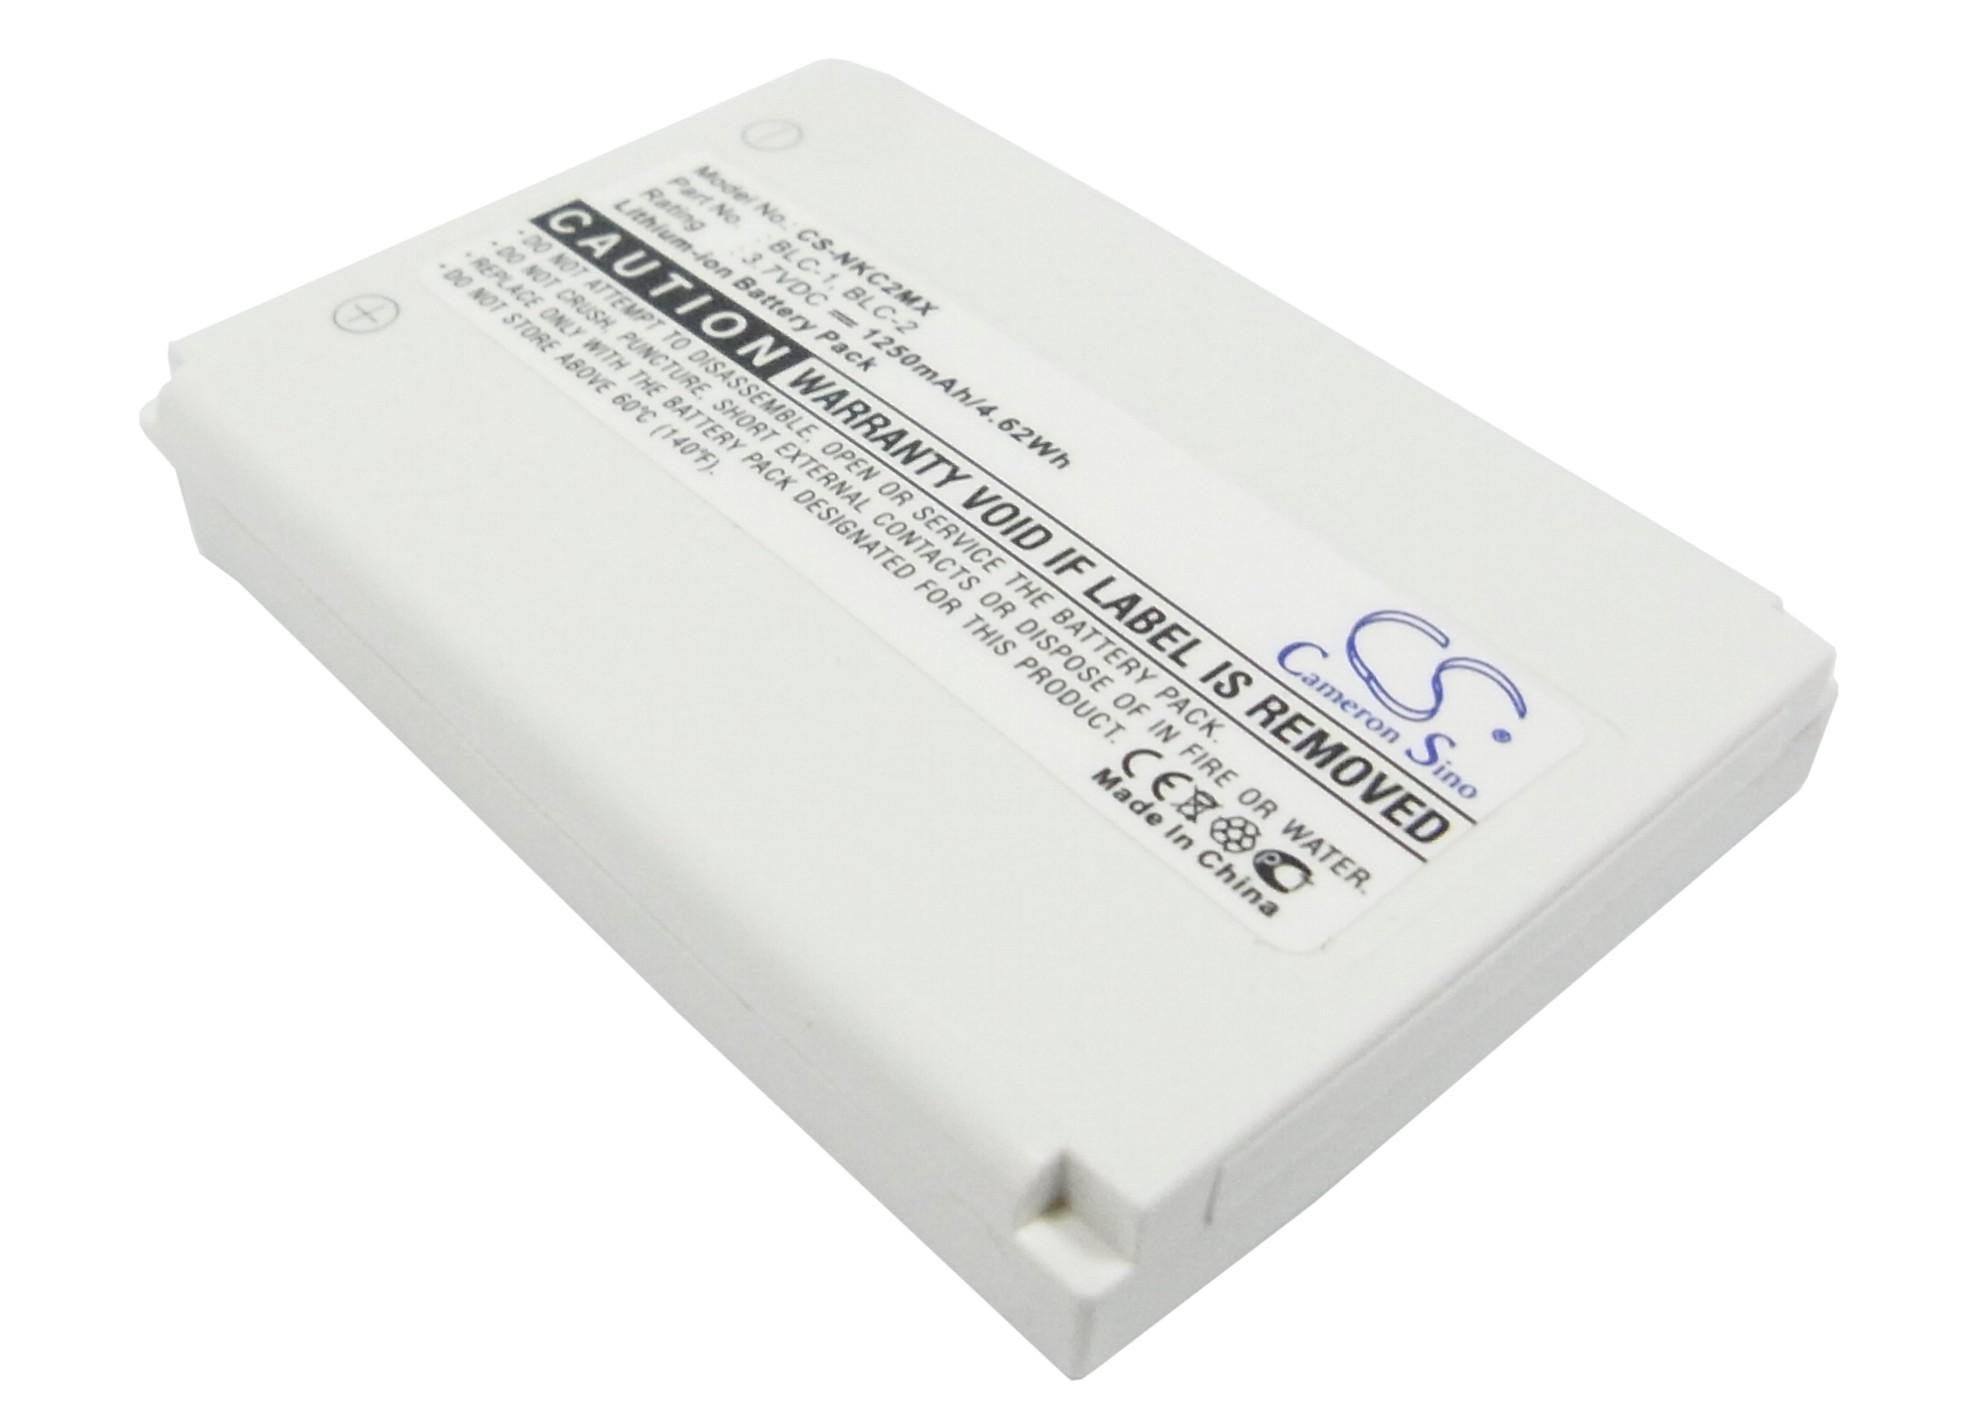 Cameron Sino baterie do mobilů pro NOKIA 3510i 3.7V Li-ion 1250mAh bílá - neoriginální